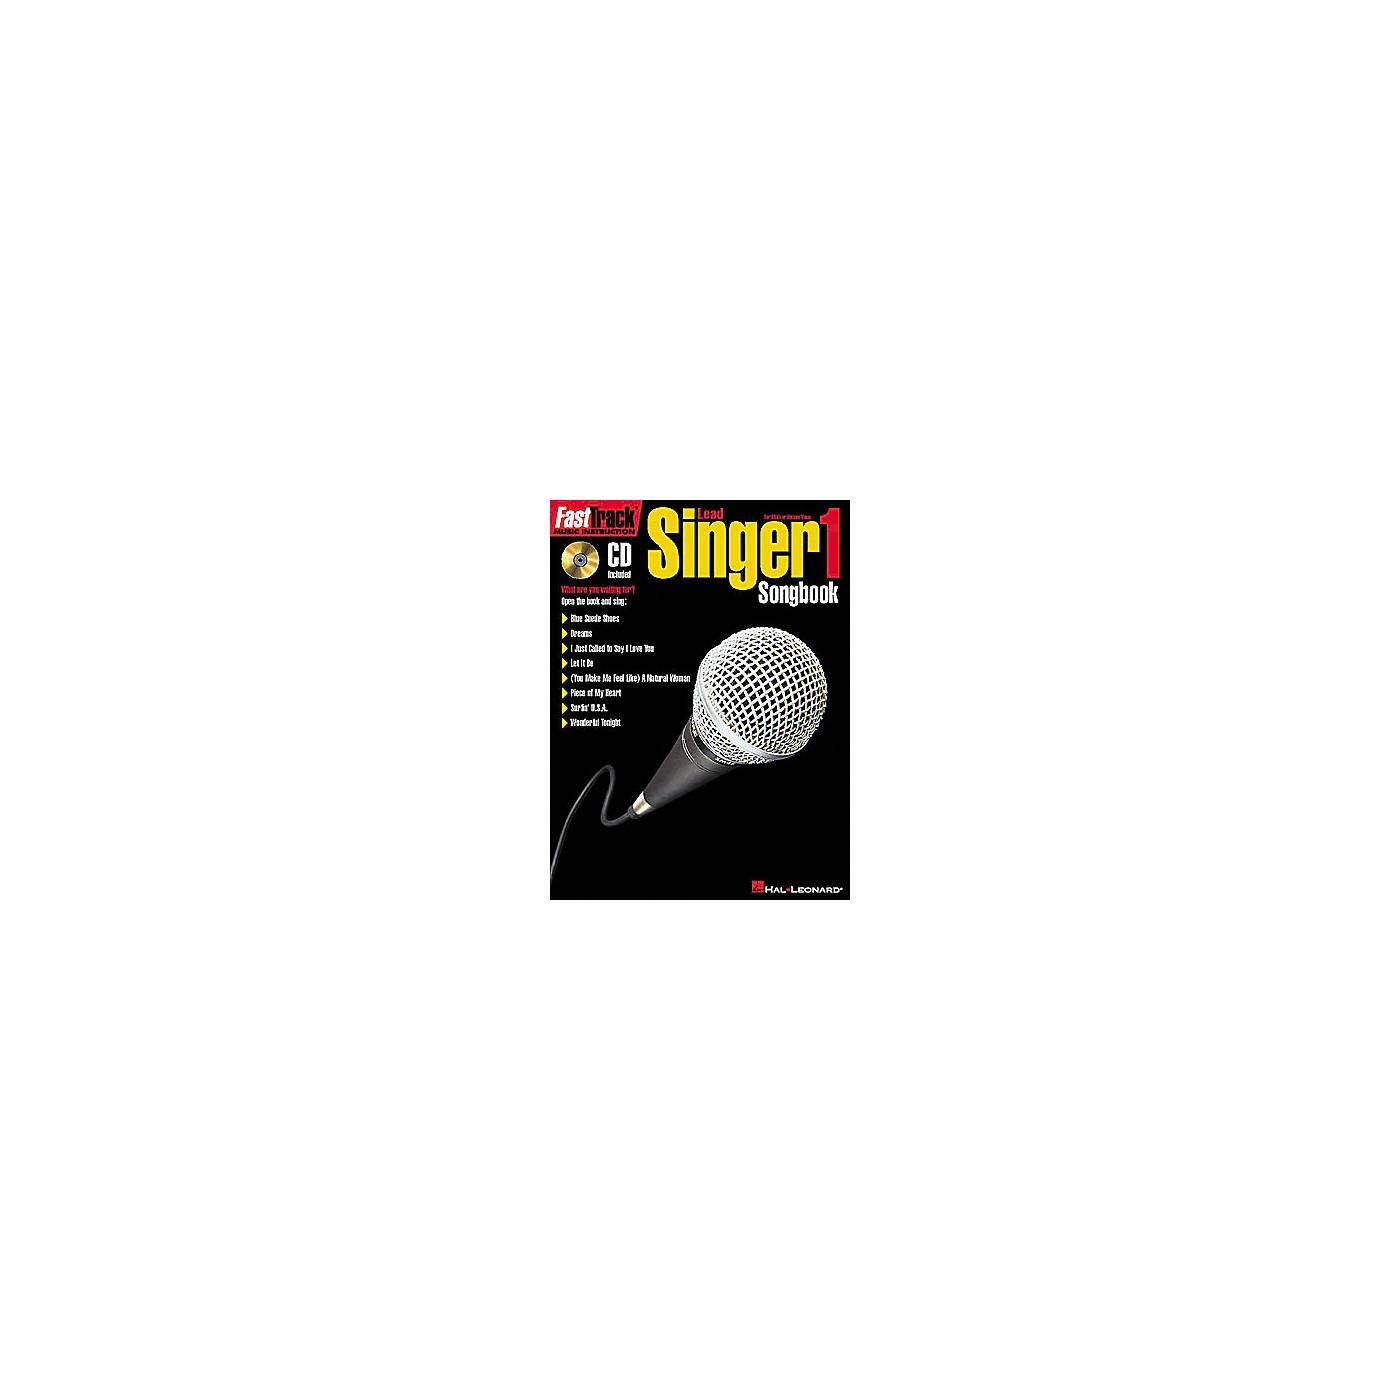 Hal Leonard FastTrack Lead Singer Songbook 1 - Level 1 Book/CD thumbnail